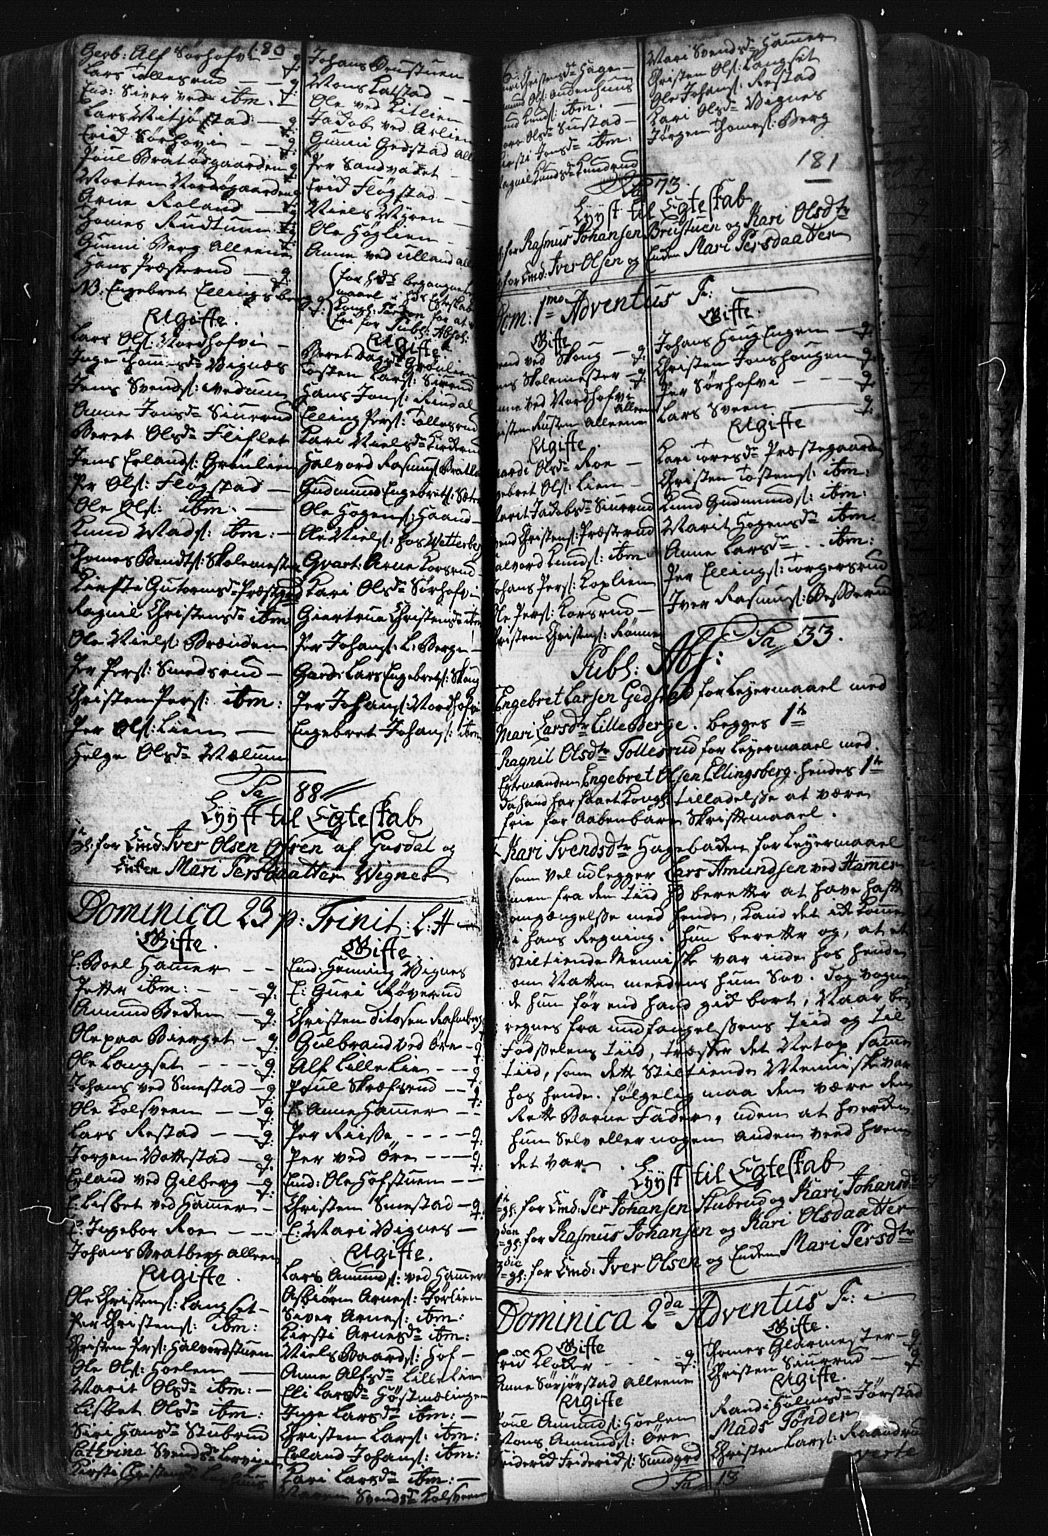 SAH, Fåberg prestekontor, Klokkerbok nr. 1, 1727-1767, s. 180-181